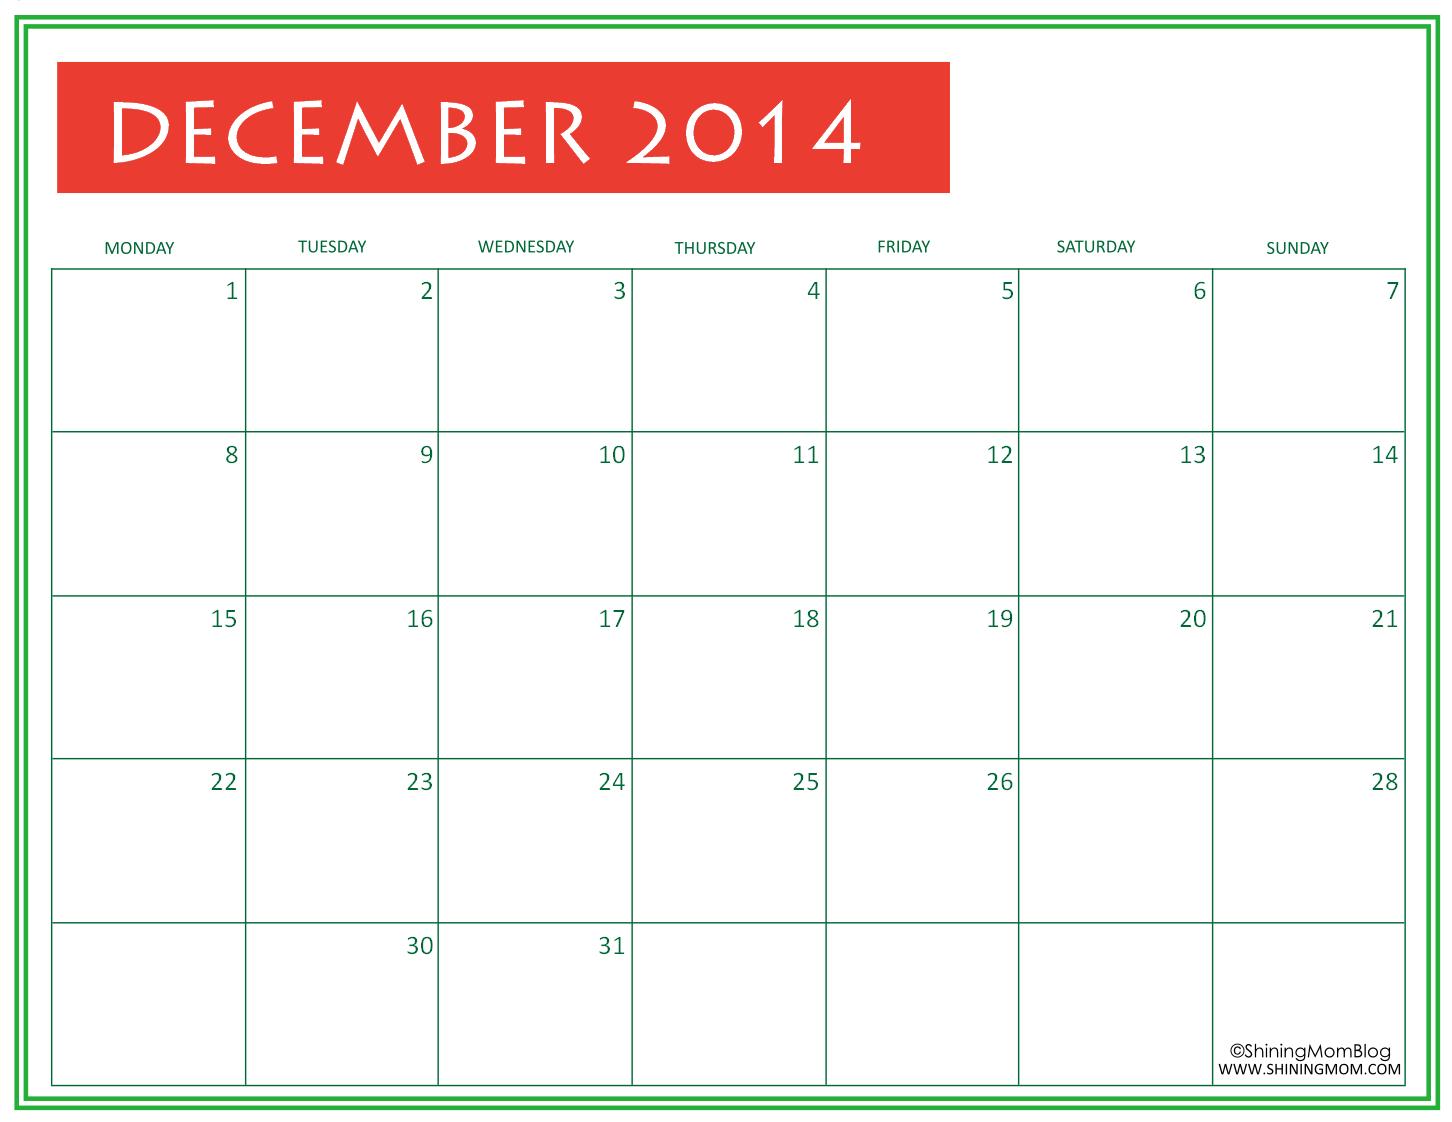 FREE Printable December 2014 Calendar by Shining Mom